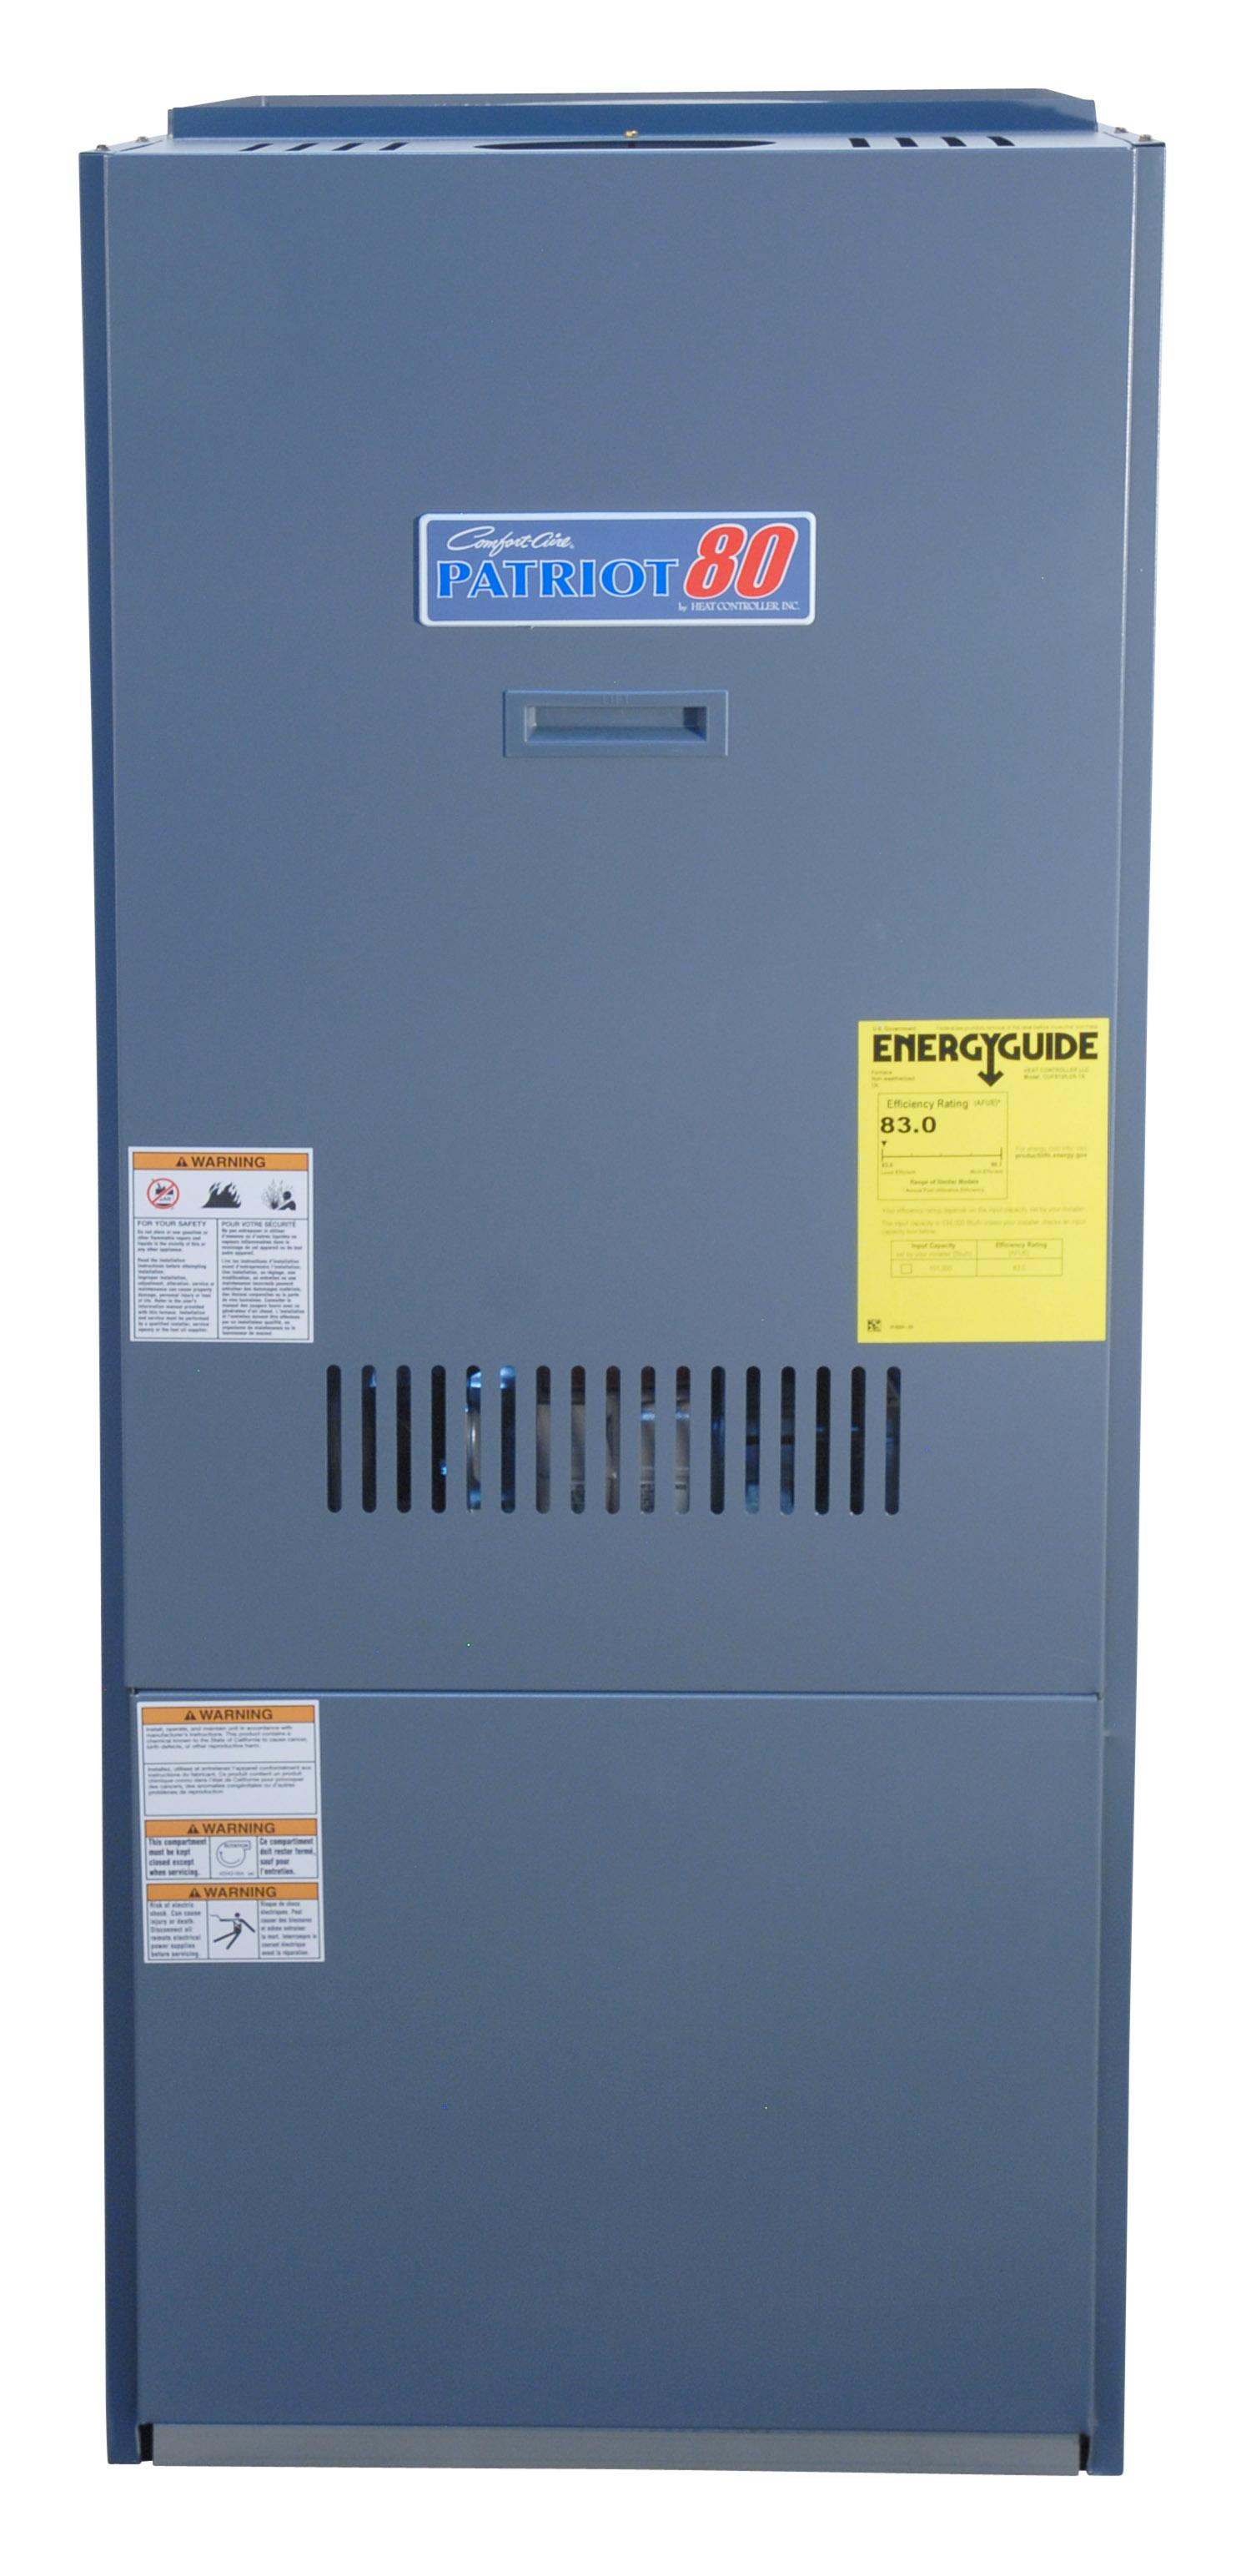 Comfort Aire Oufb75 D3 3a Highboy Upflow 67 500 85 Input Btu Oil Plemun Heat And Pump Thermostat Wiring Diagram Furnace